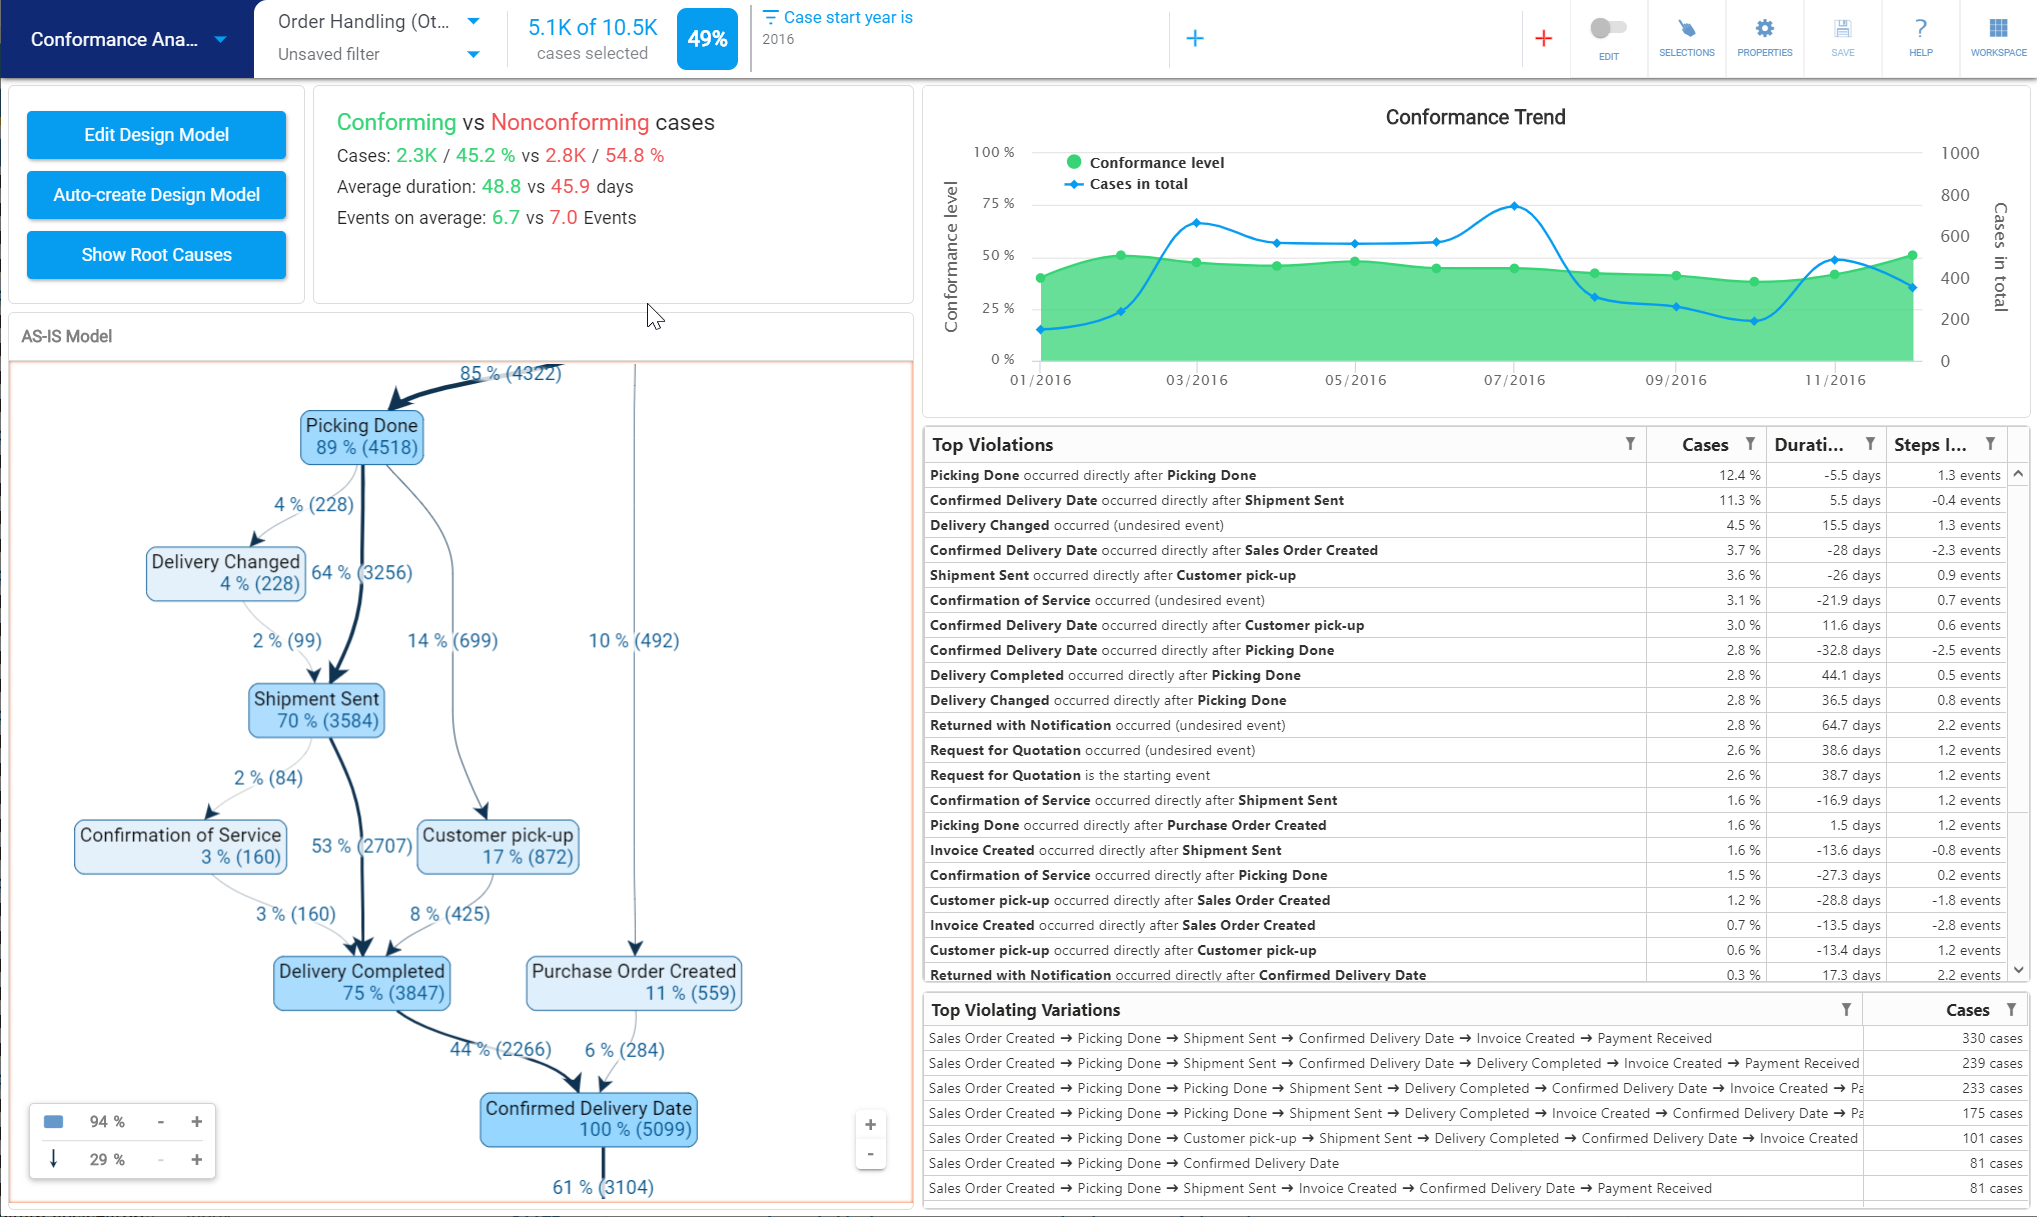 QPR ProcessAnalyzer 2020_2 - Conformance Analysis